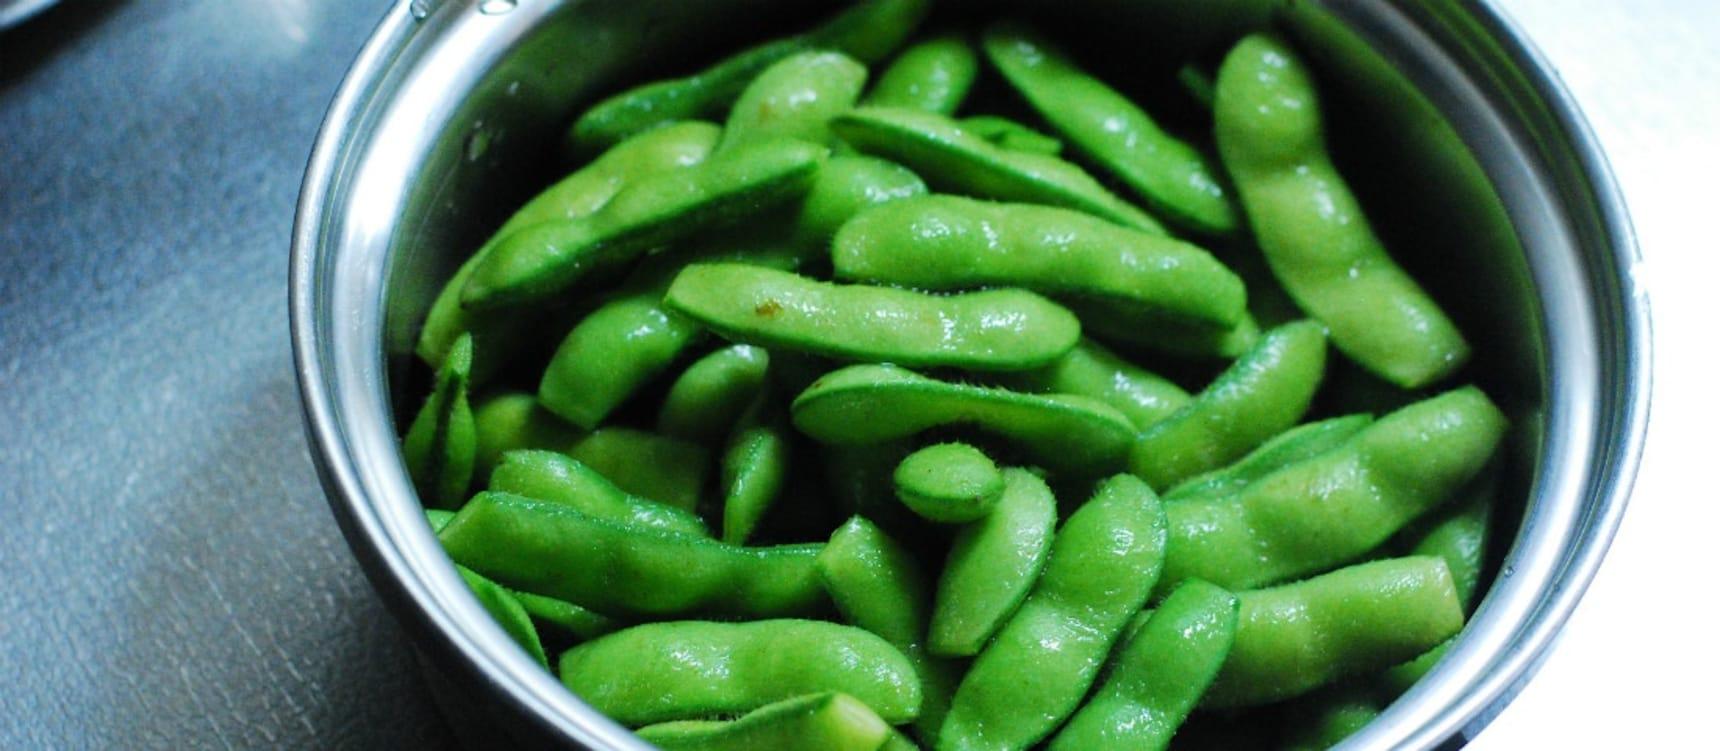 Edamame: Japan's Favorite Snack